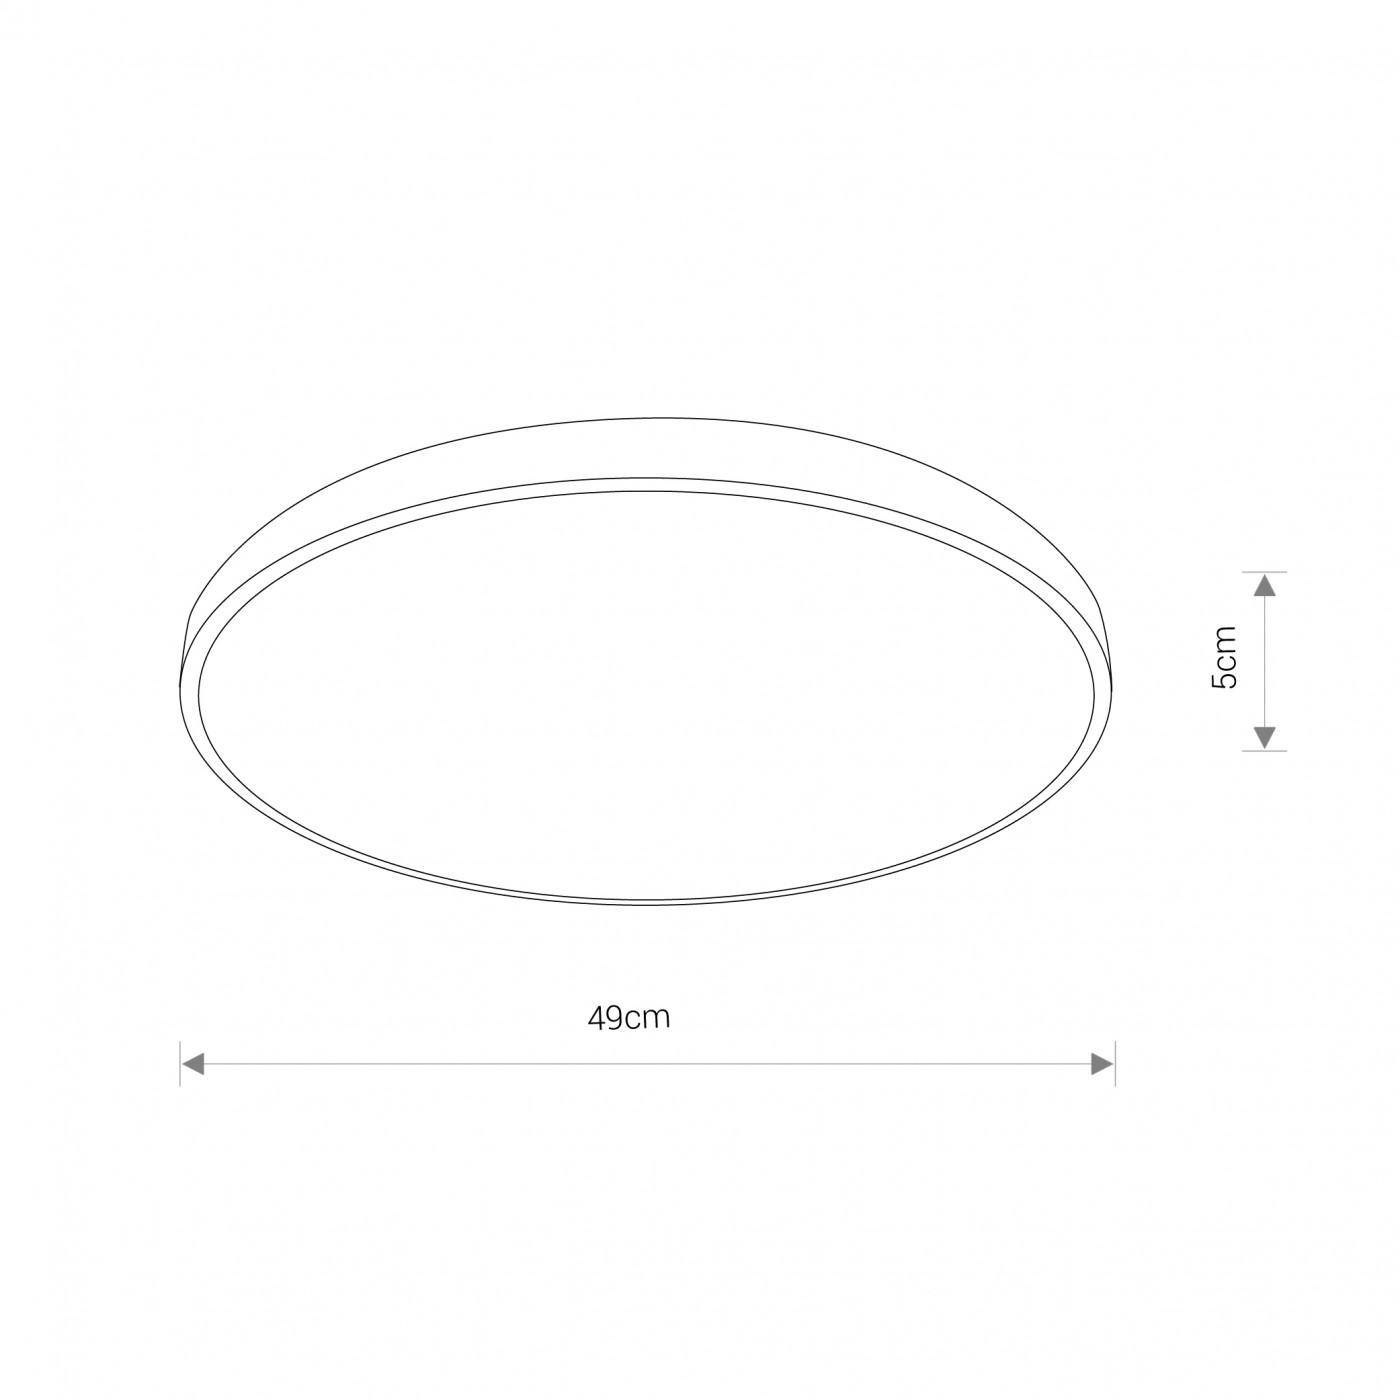 Nowodvorski TL-8208 Agnes Round LED víz-védett mennyezeti lámpa